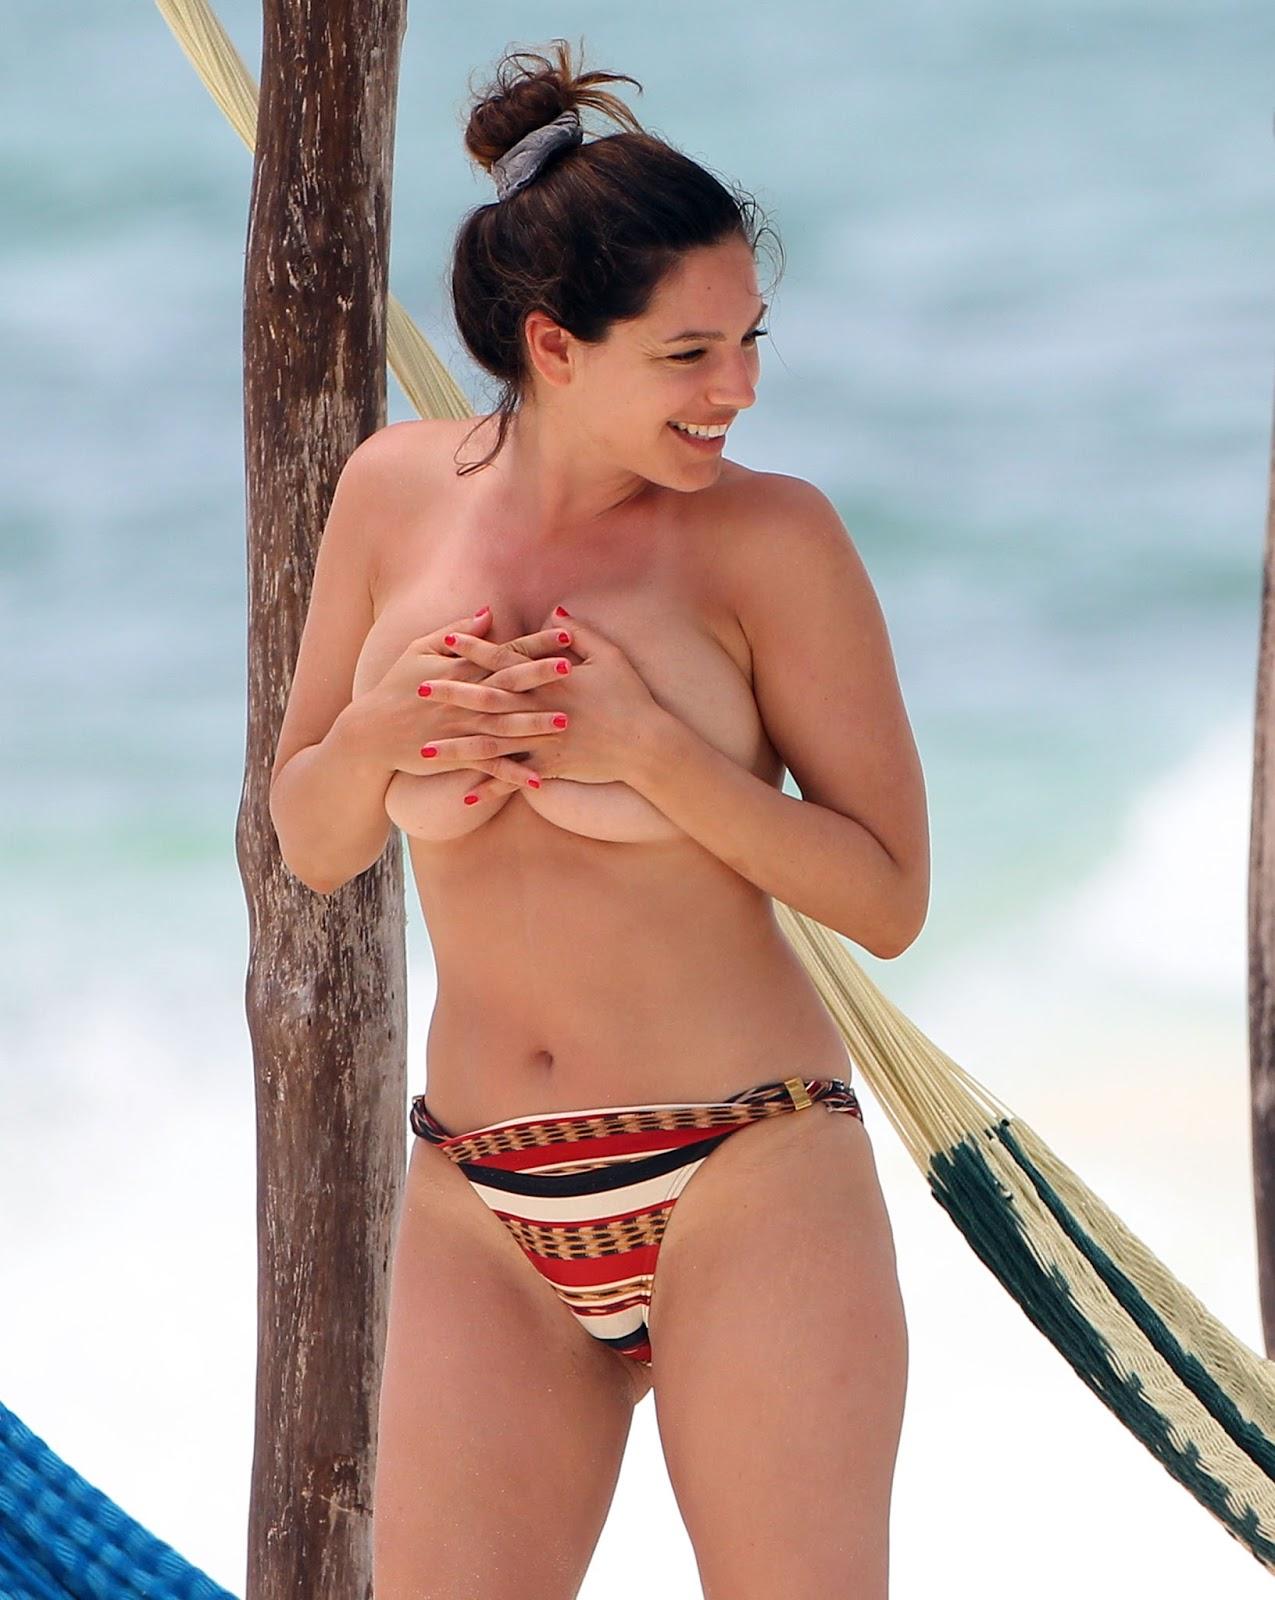 Friends in bikinis big and litte tits Kelly Brook Topless Big Boobs Bikini Candids On The Beach In Cancun Arab Girl Images